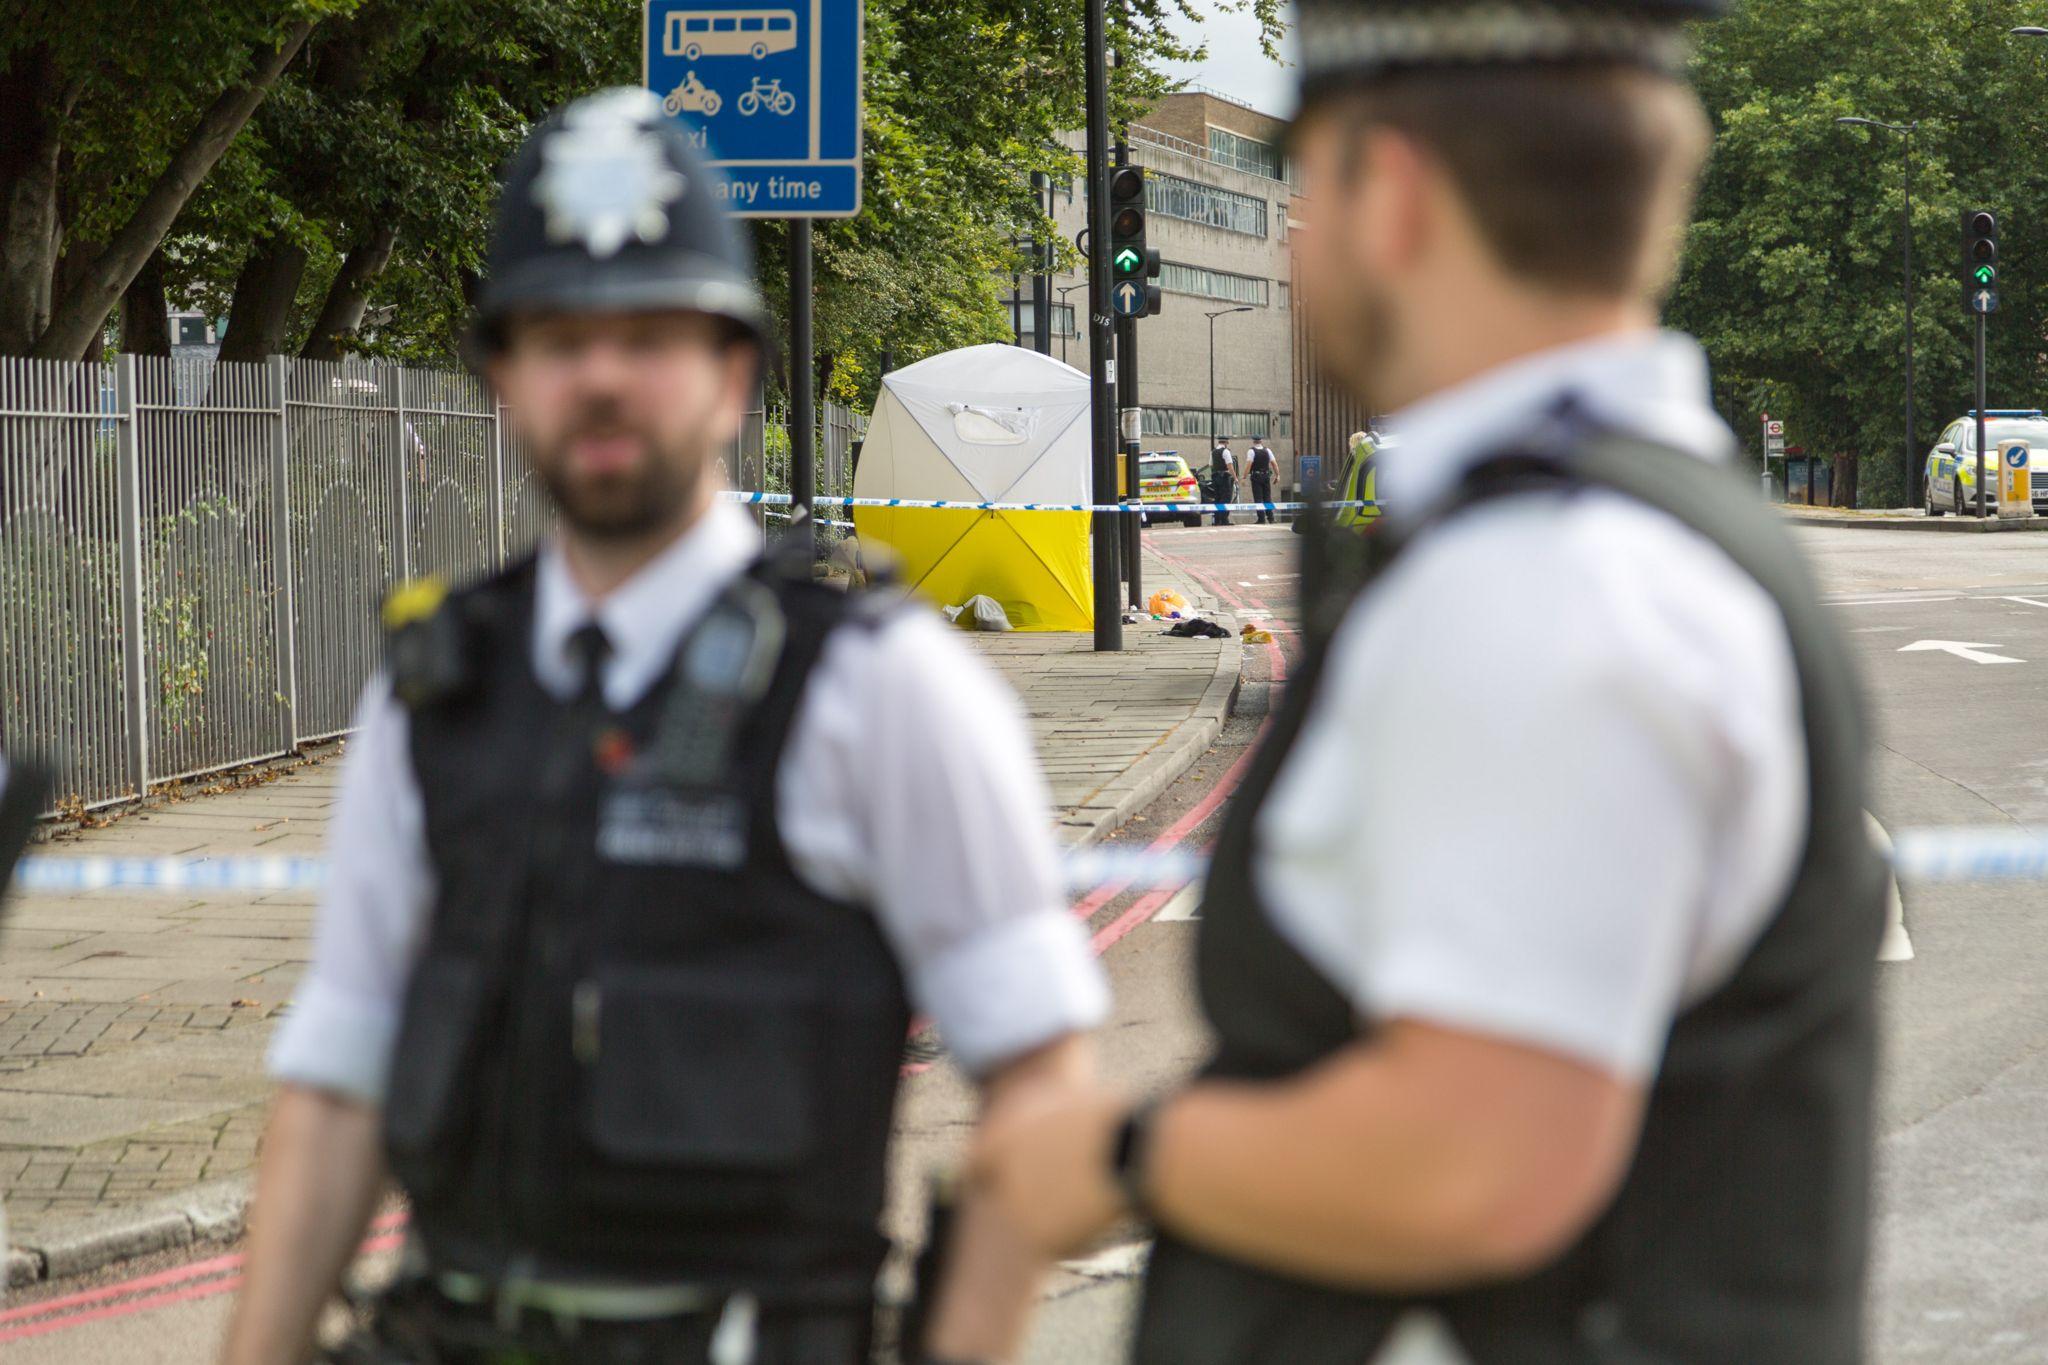 Photo of police at a crime scene